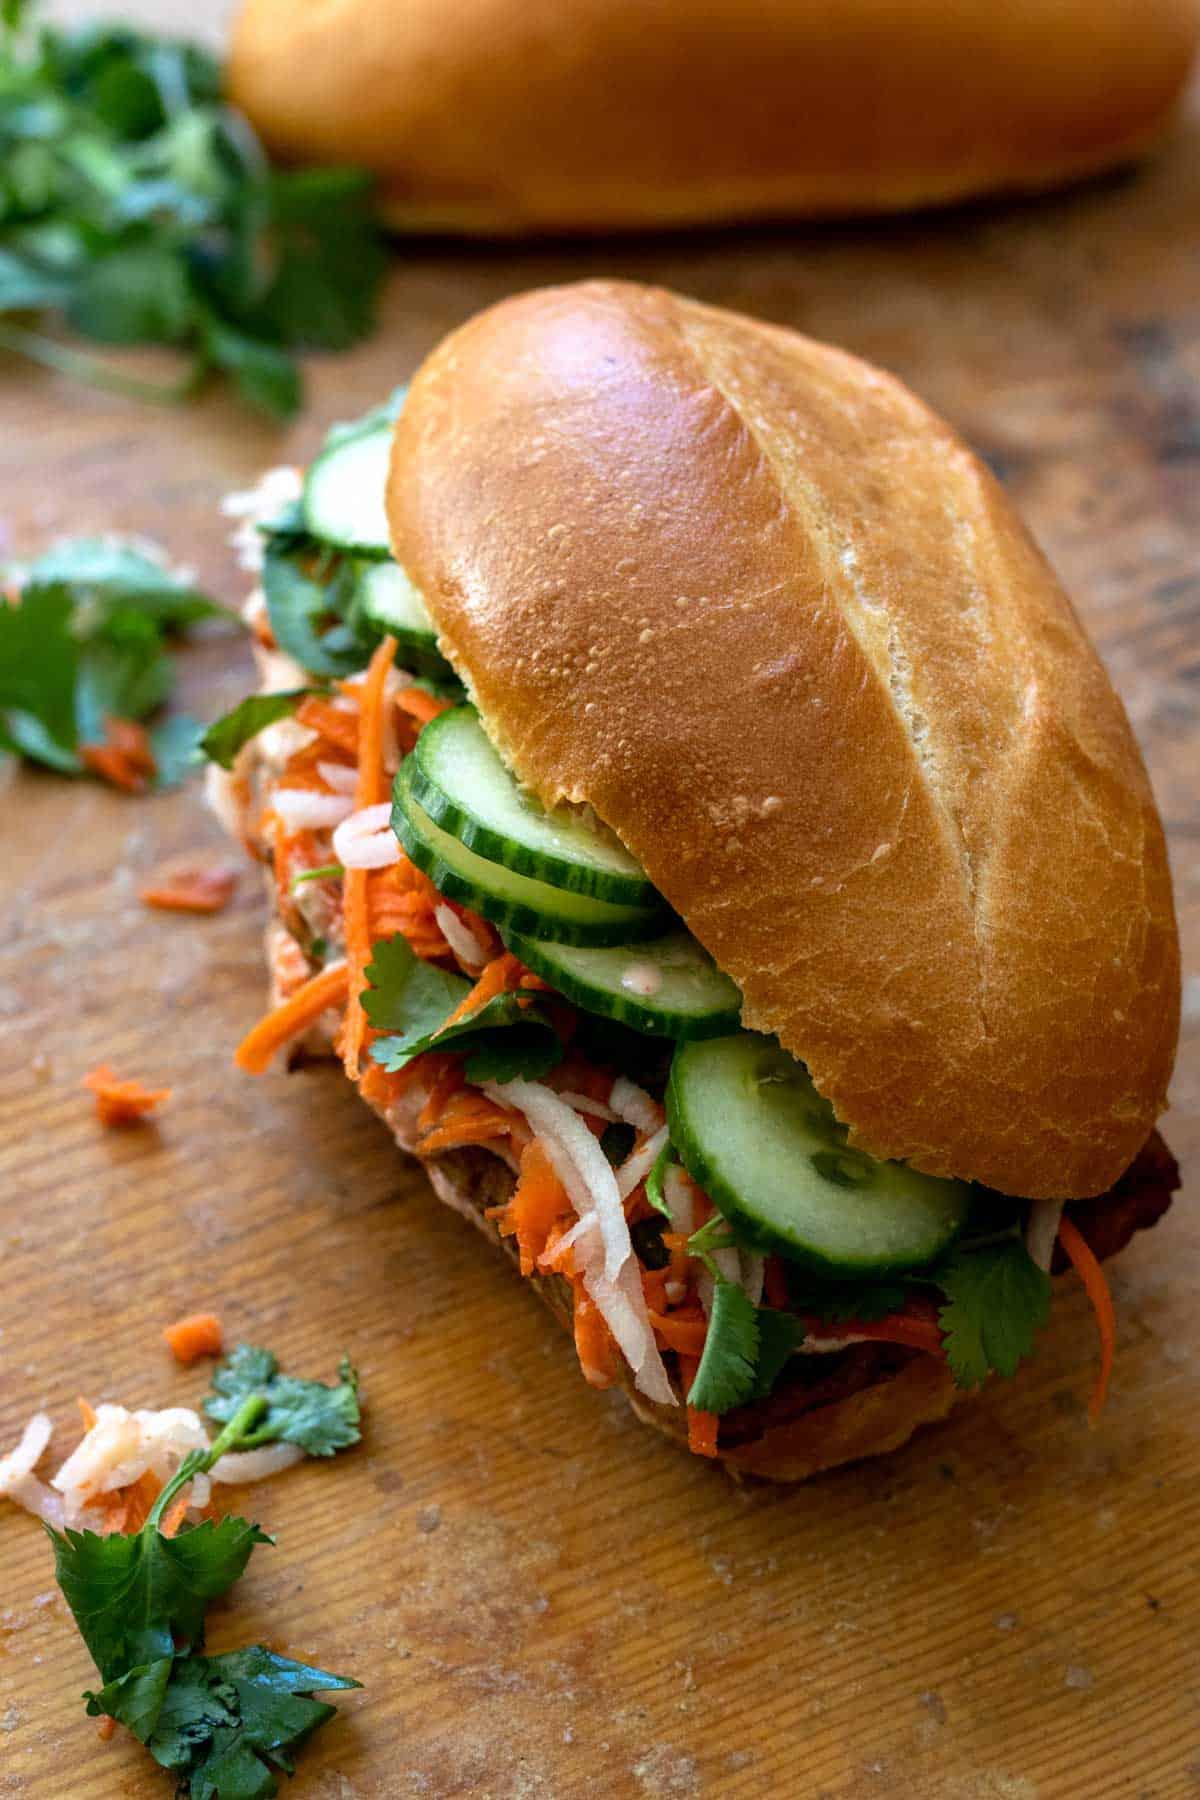 Closeup view of banh mi sandwiches.